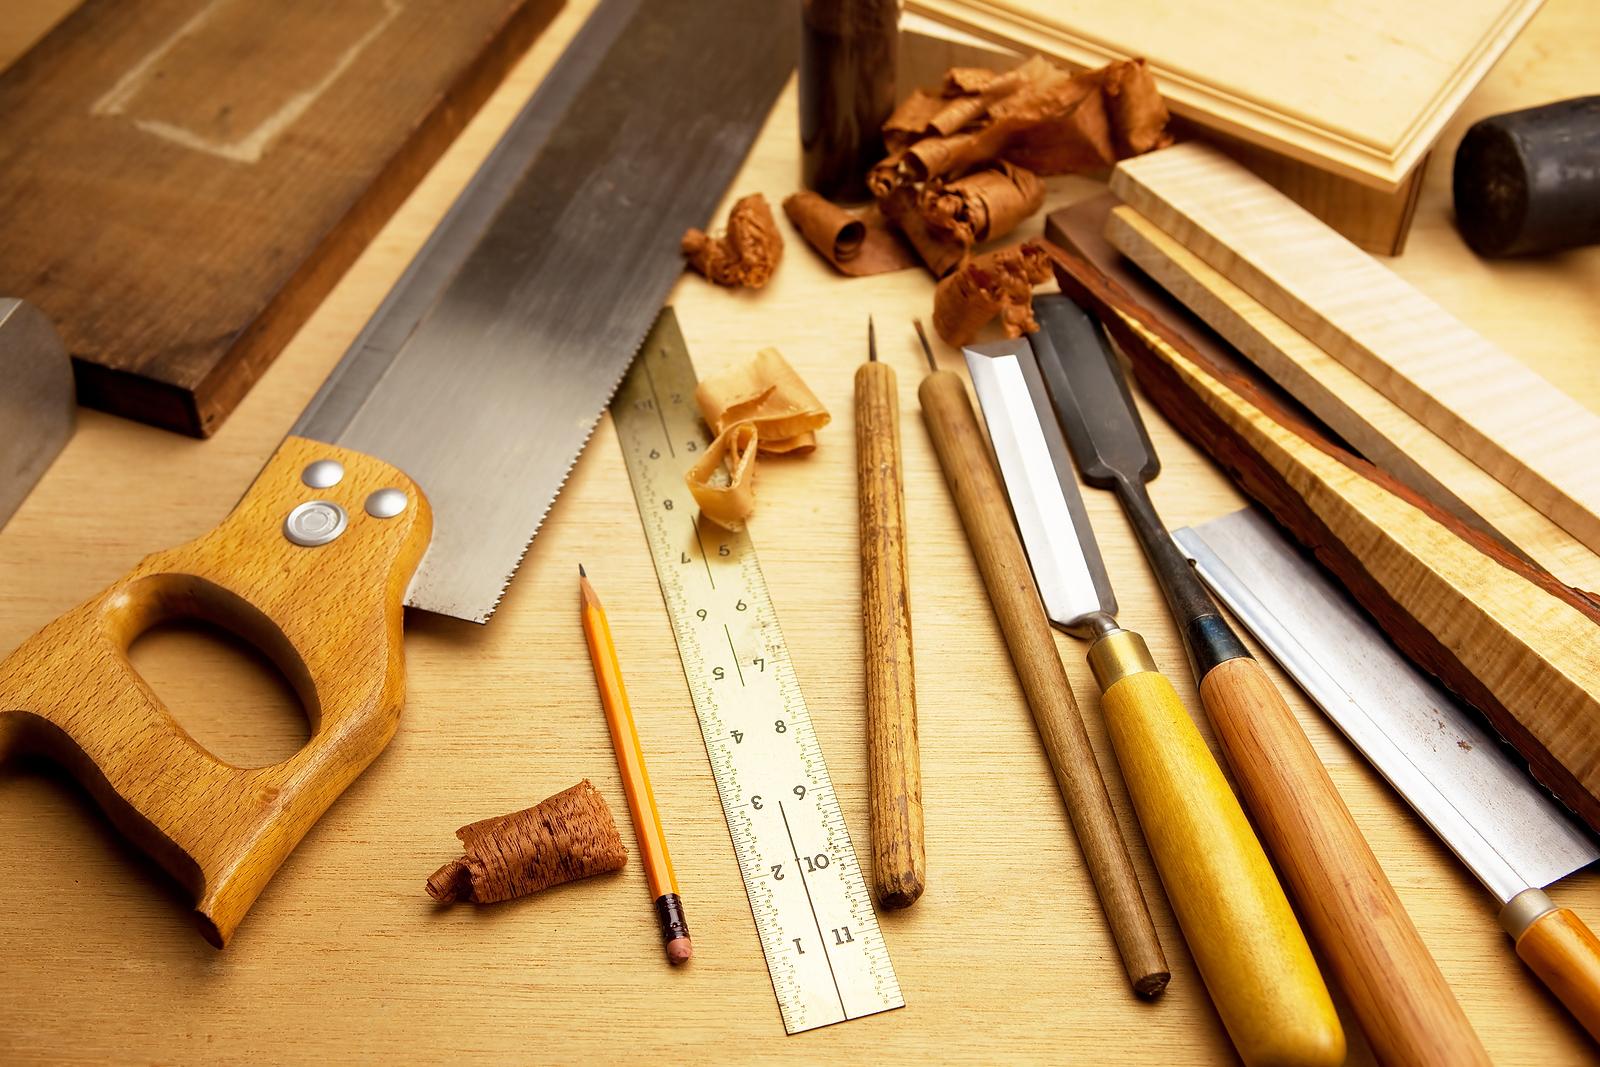 Woodworking Basics II